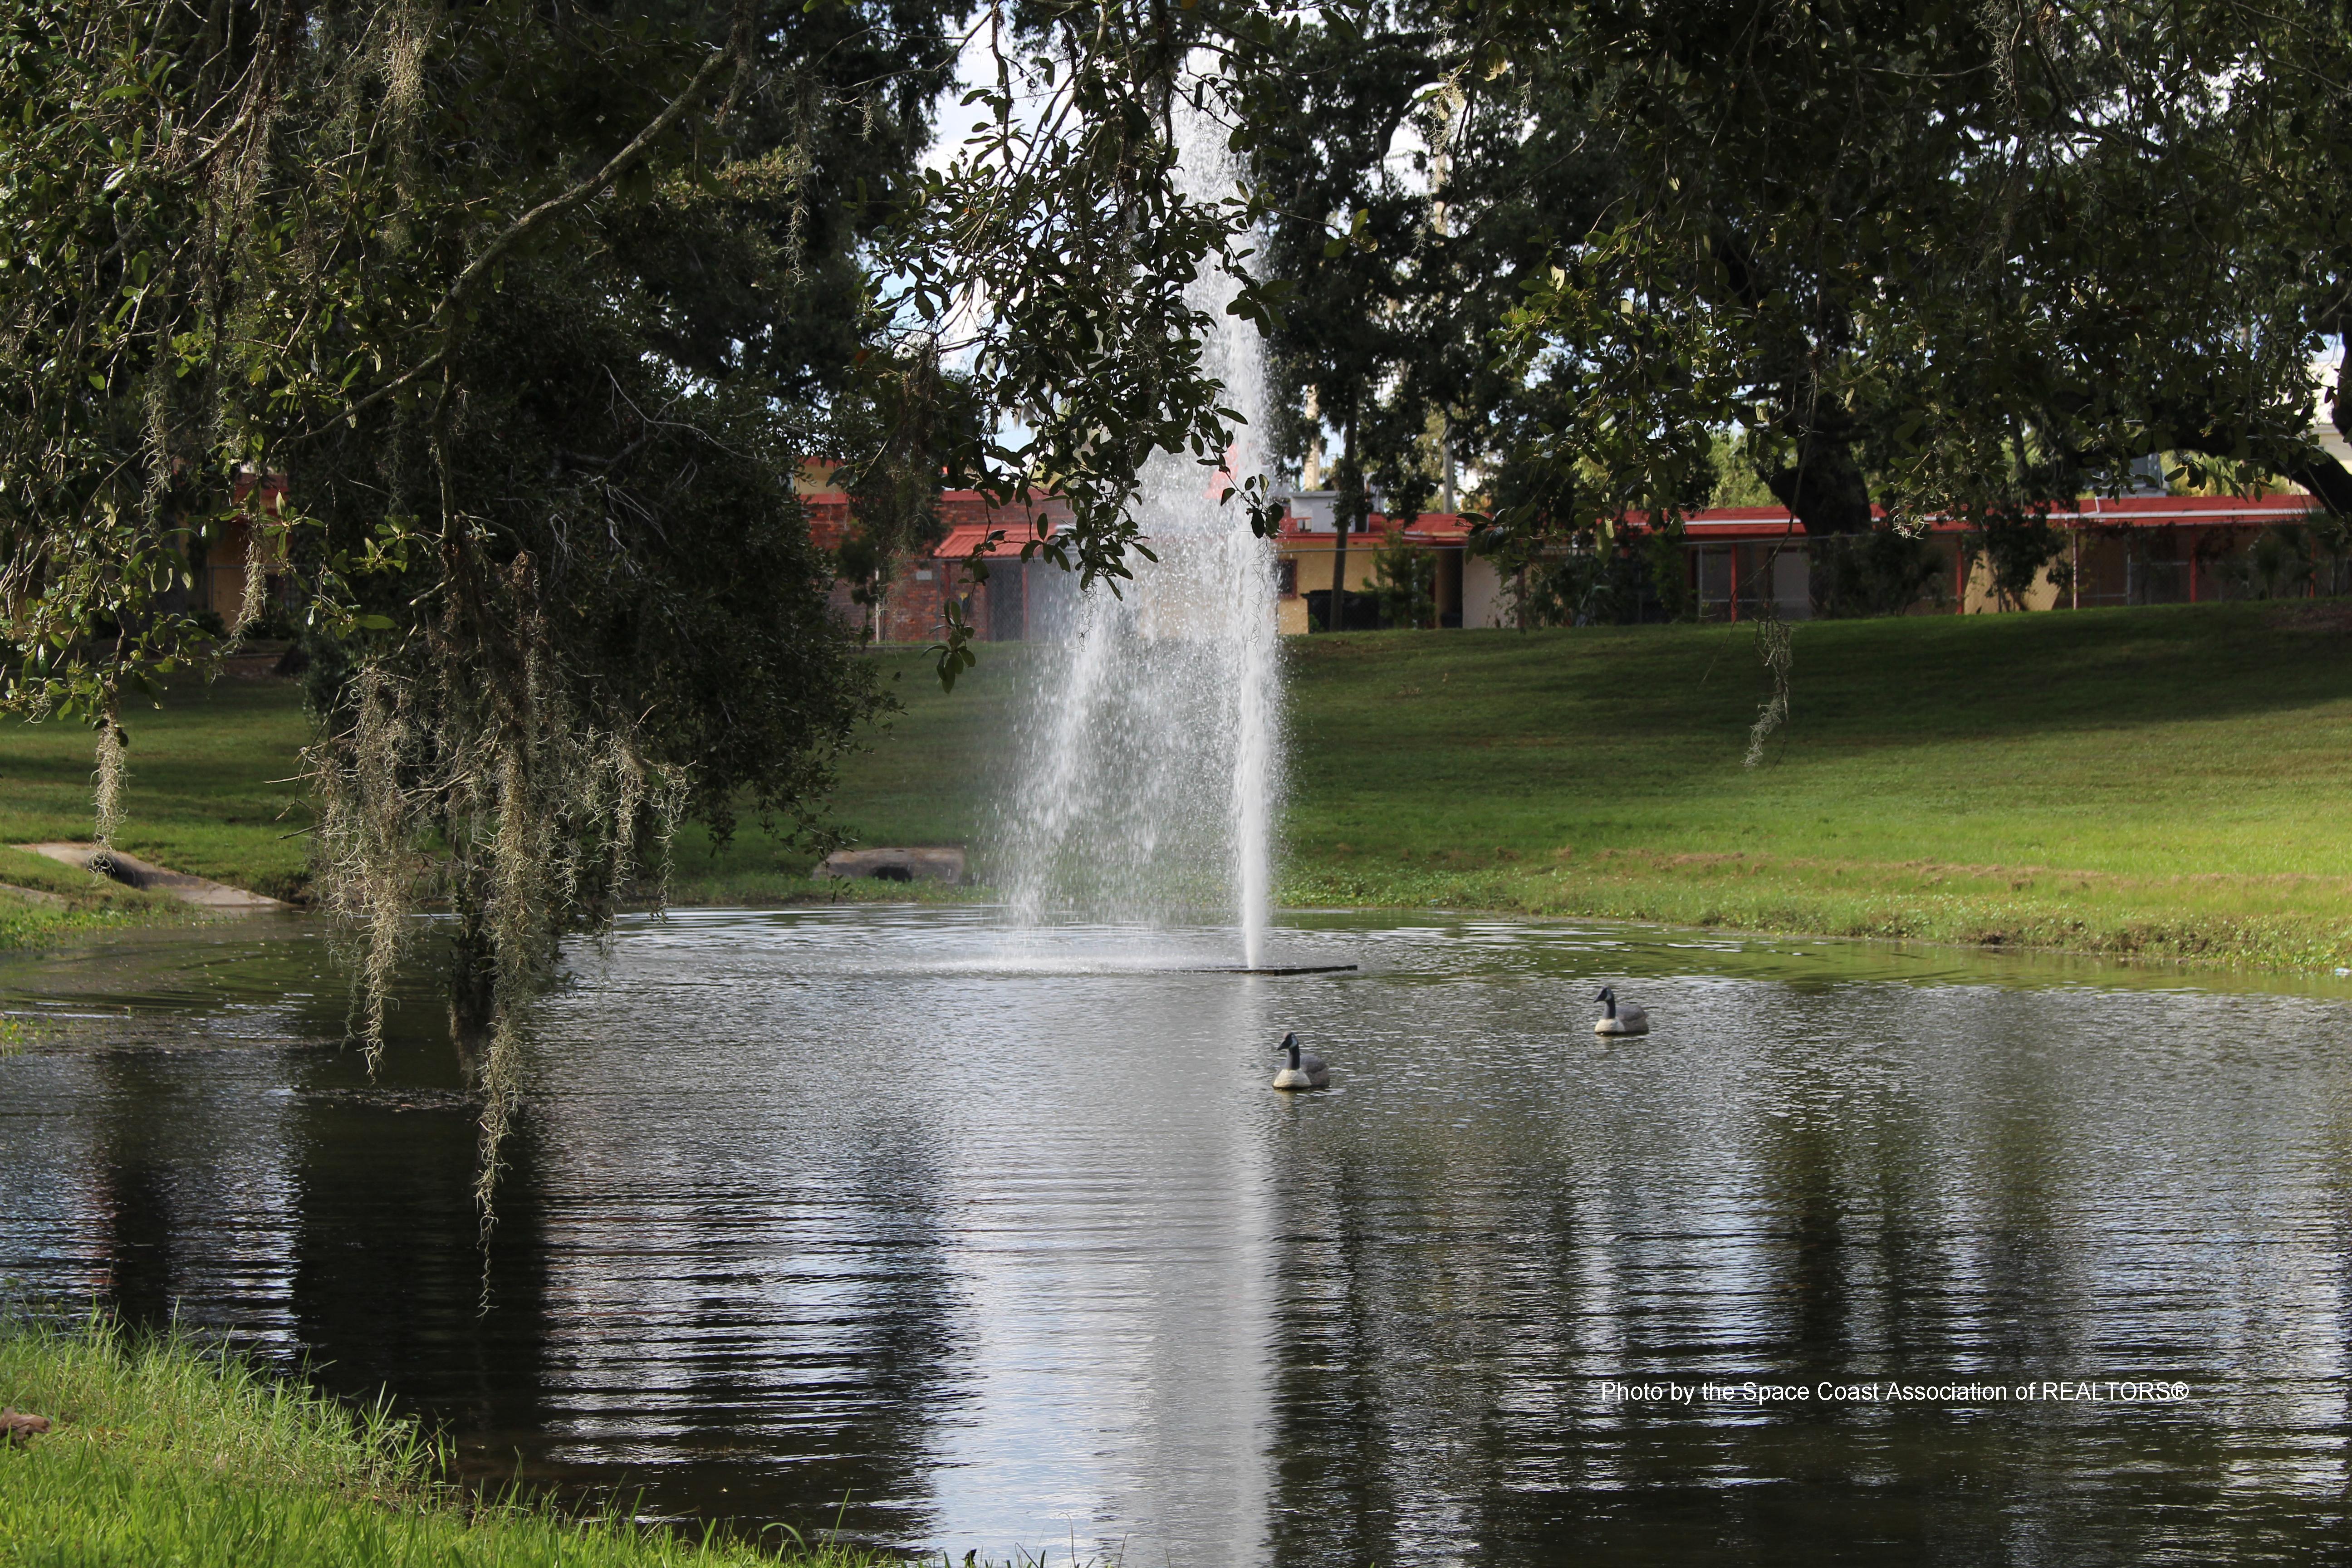 Morris Park, Rockledge, Florida